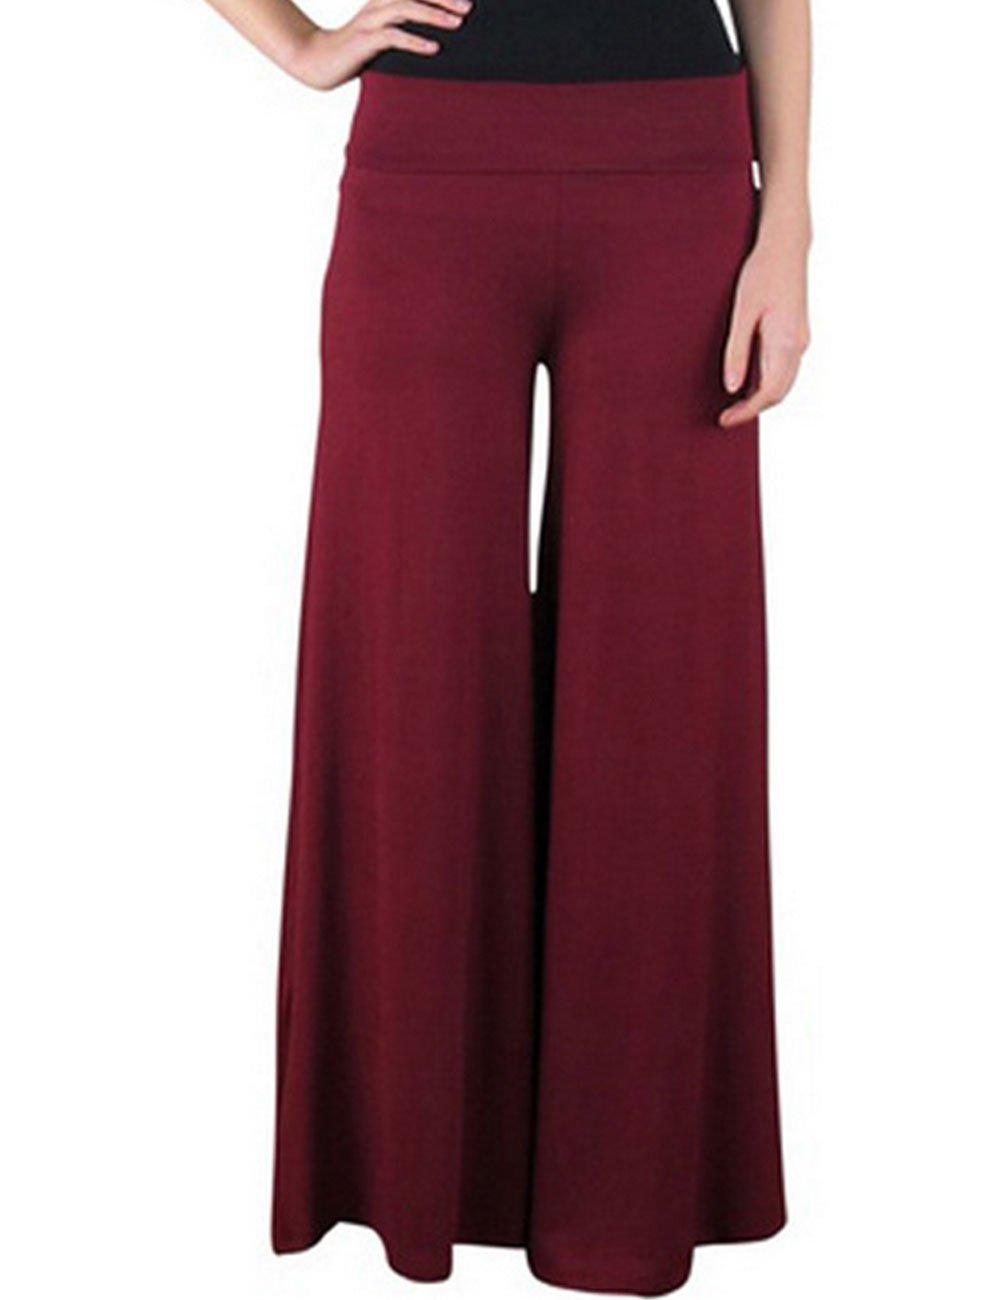 DDSOL Women's Modal Yoga Wide Leg Pants Belly Dance Fitness Pilates Trousers